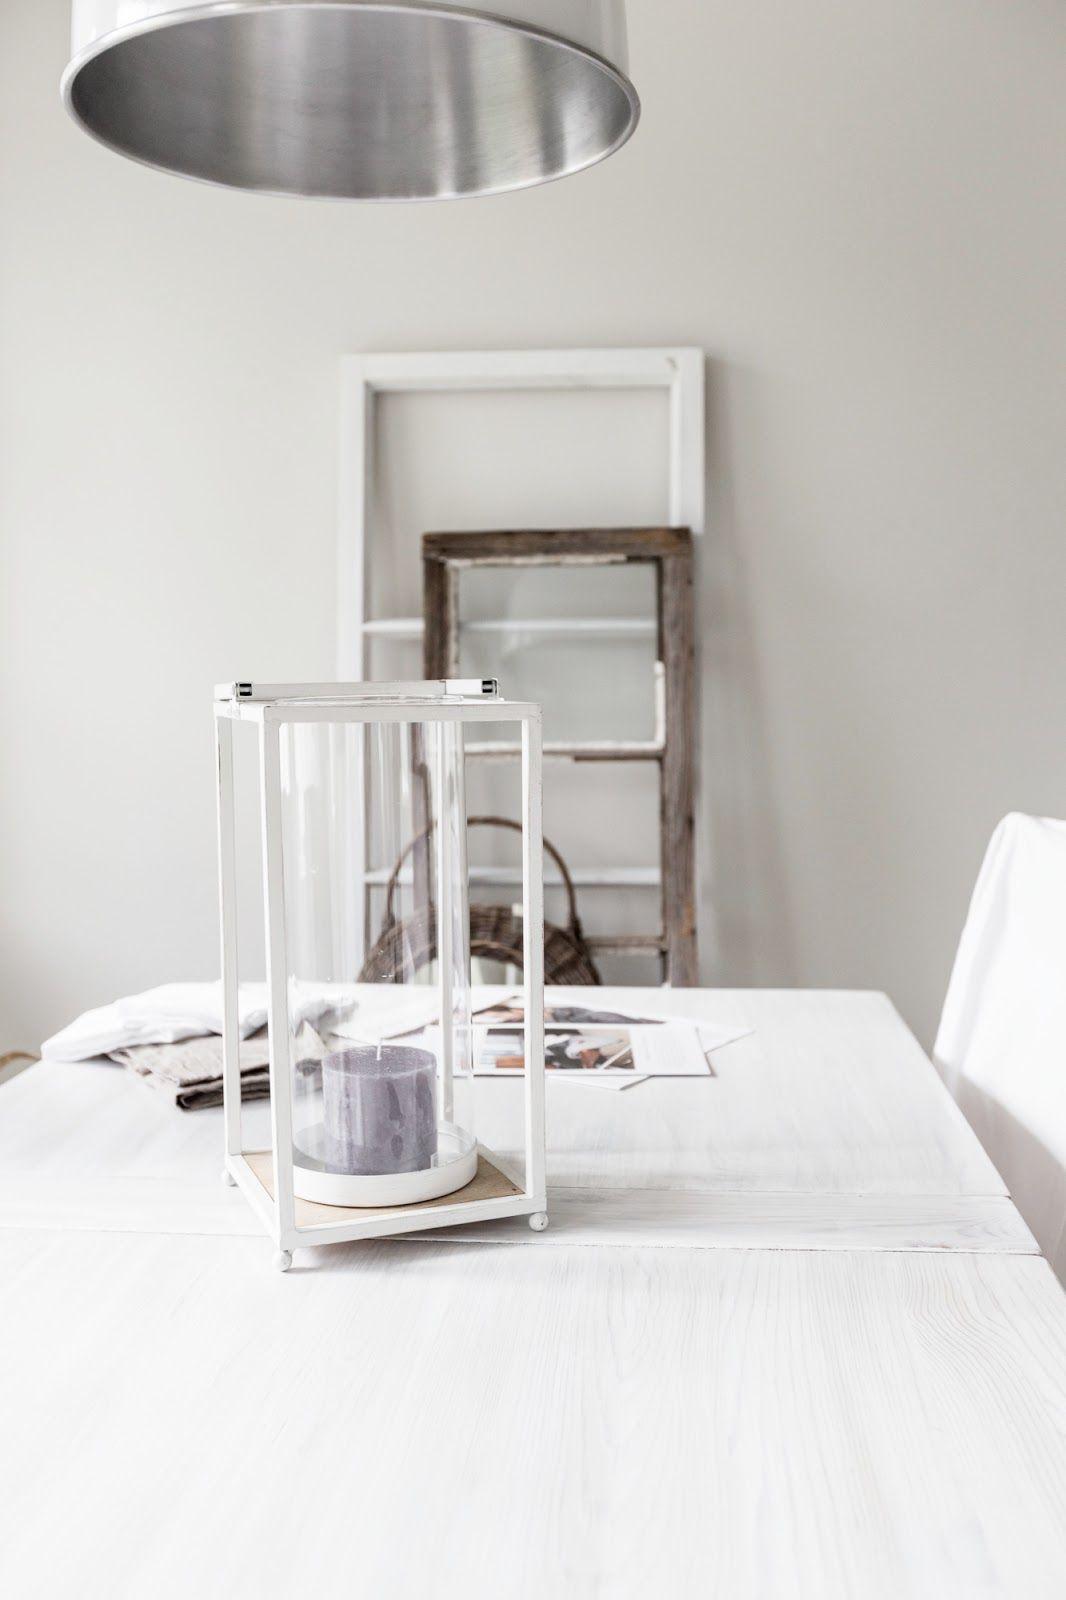 White table / greige wall / lantern  http://skiglari-norppa.blogspot.com